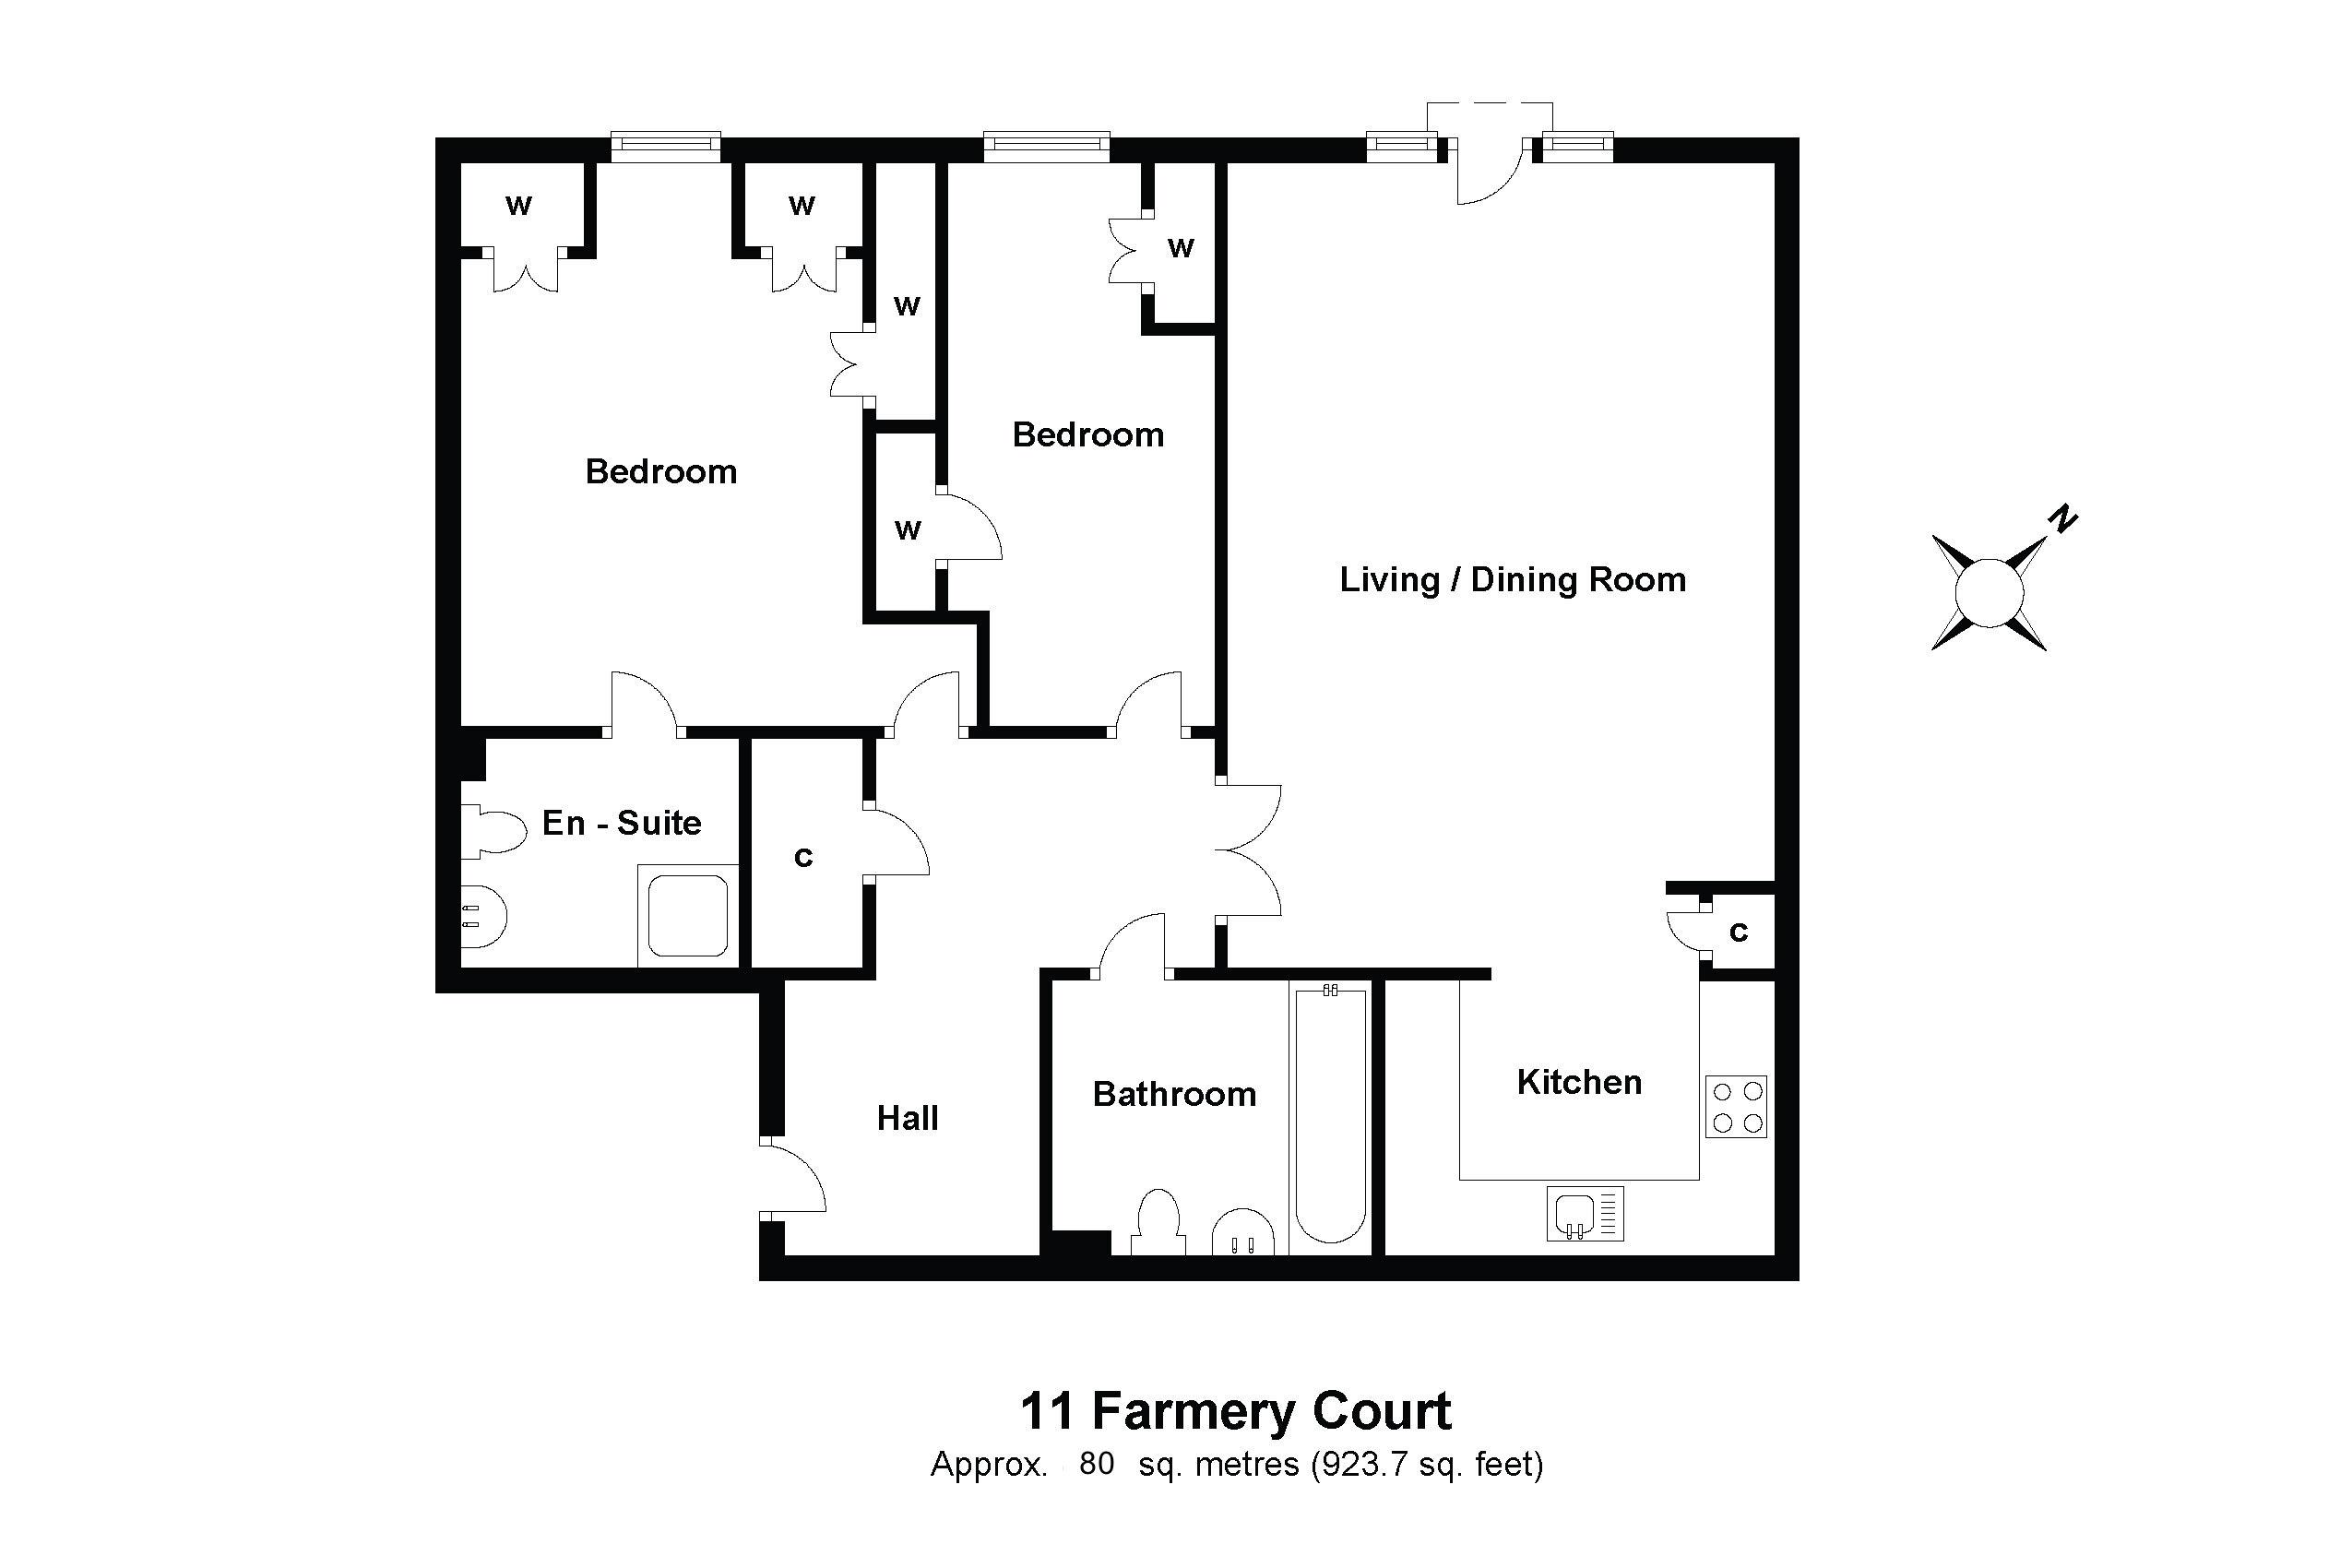 11 Farmery Court Floorplan